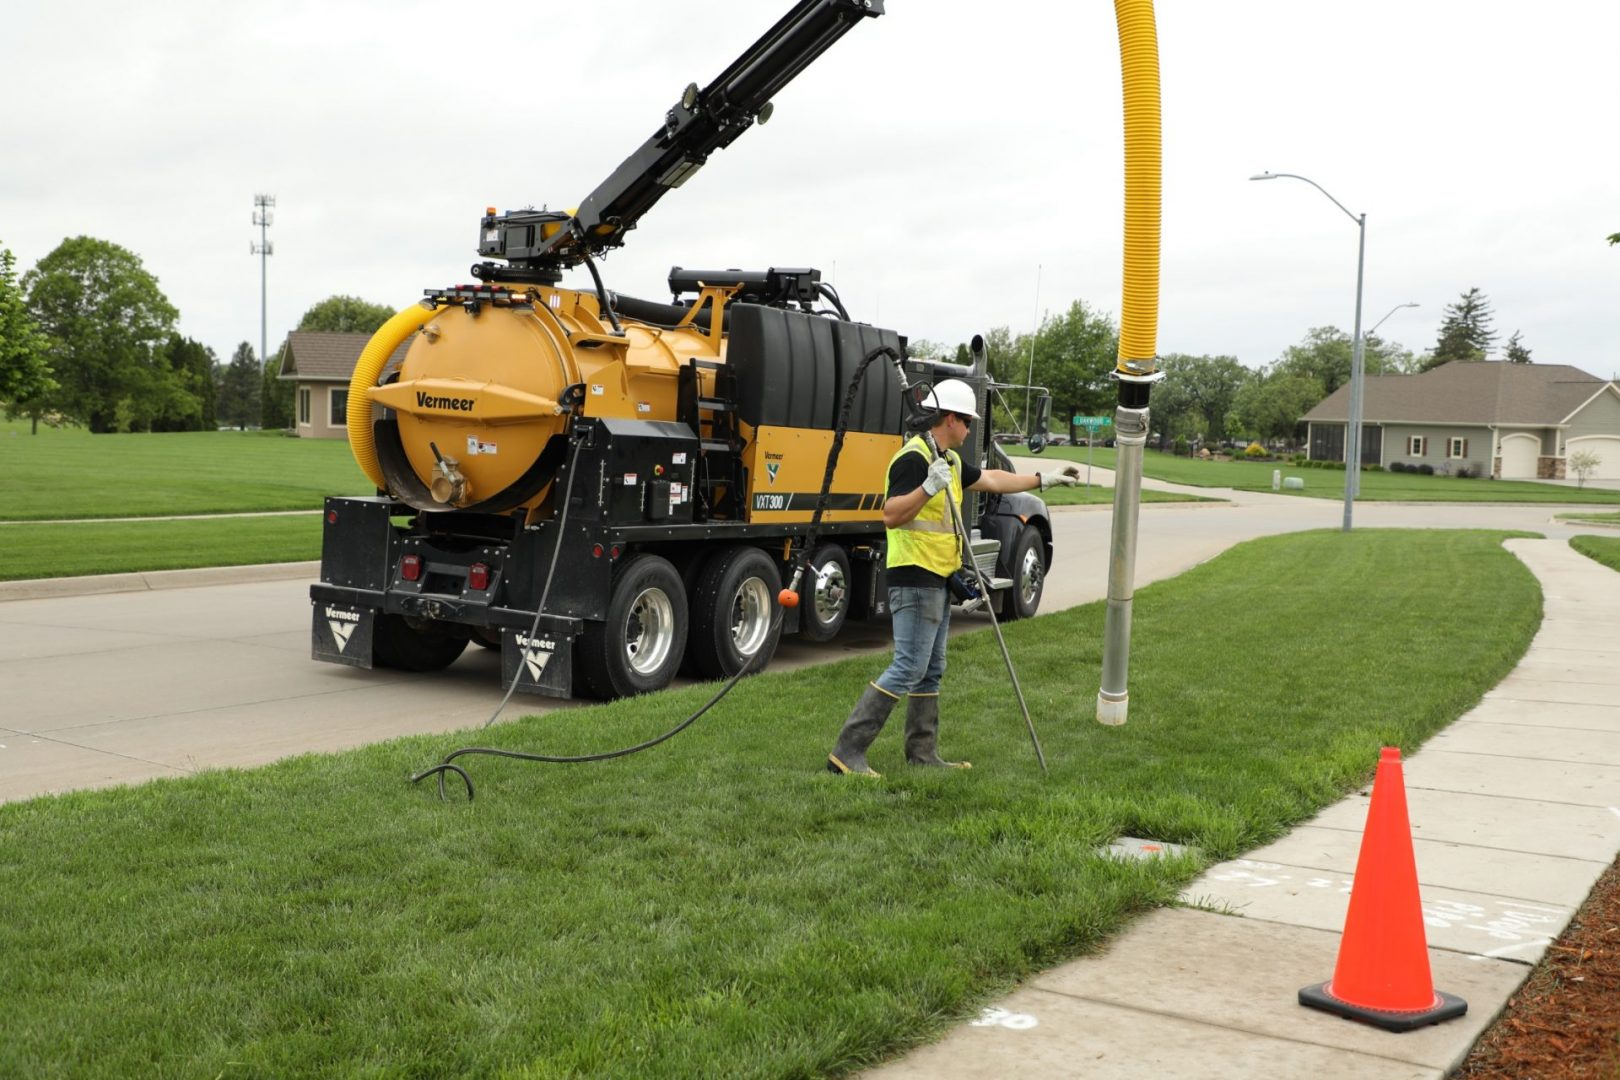 Vermeer VXT300 truck-mounted vacuum excavator in use in a suburban neighbourhood